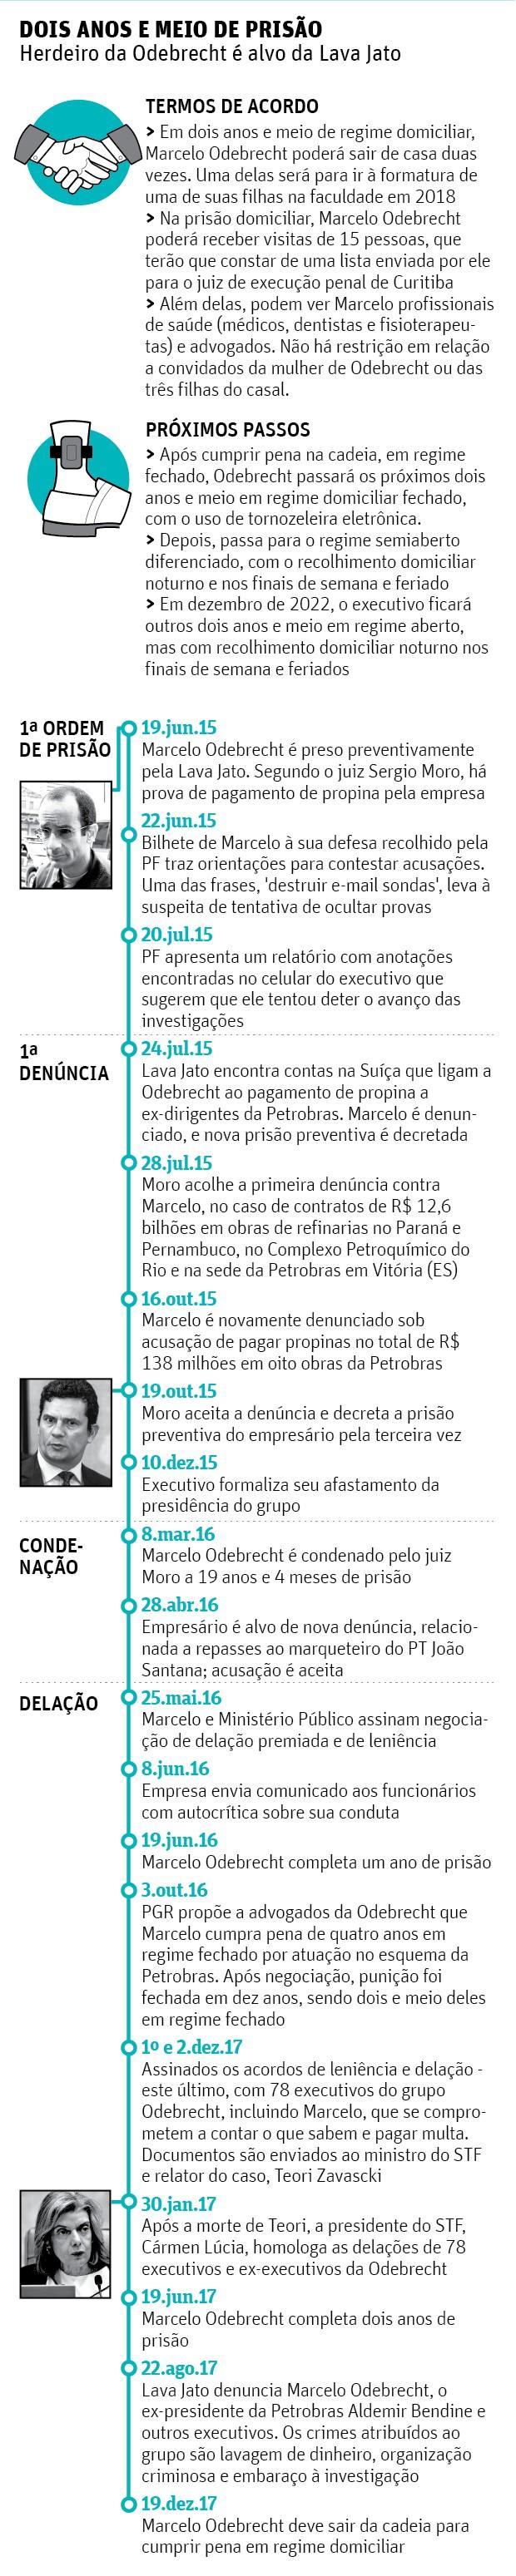 Editoria de Arte Folhapress